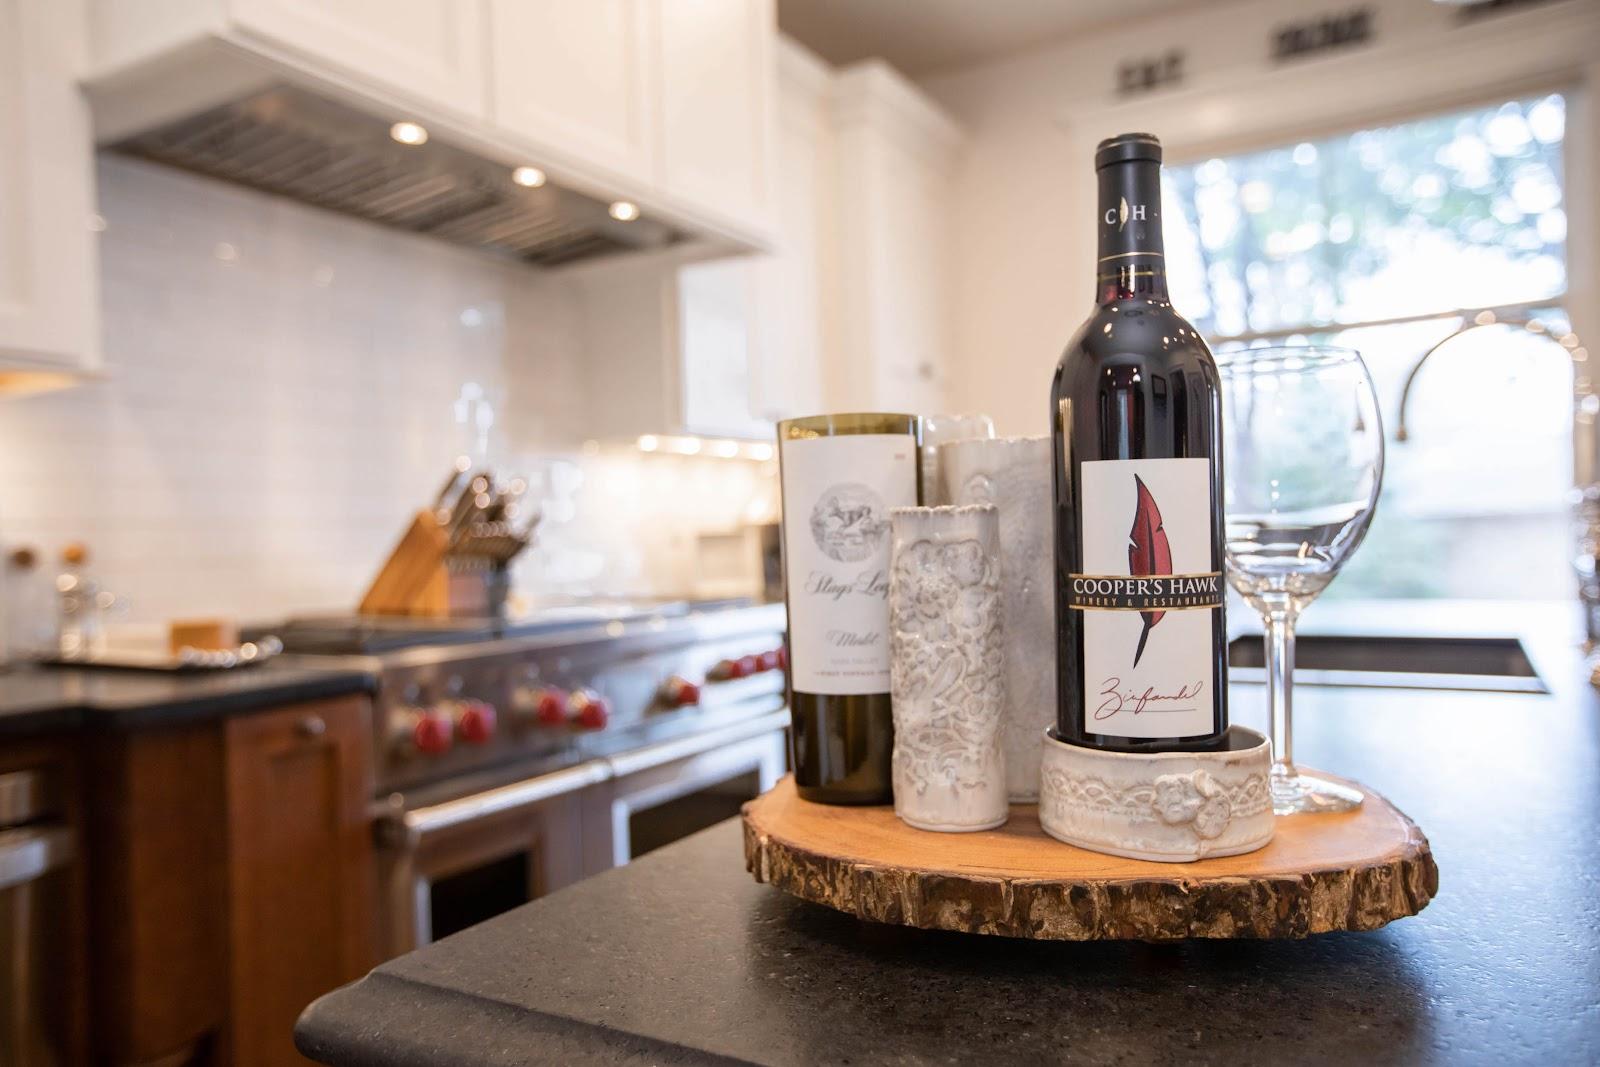 wine and kitchen